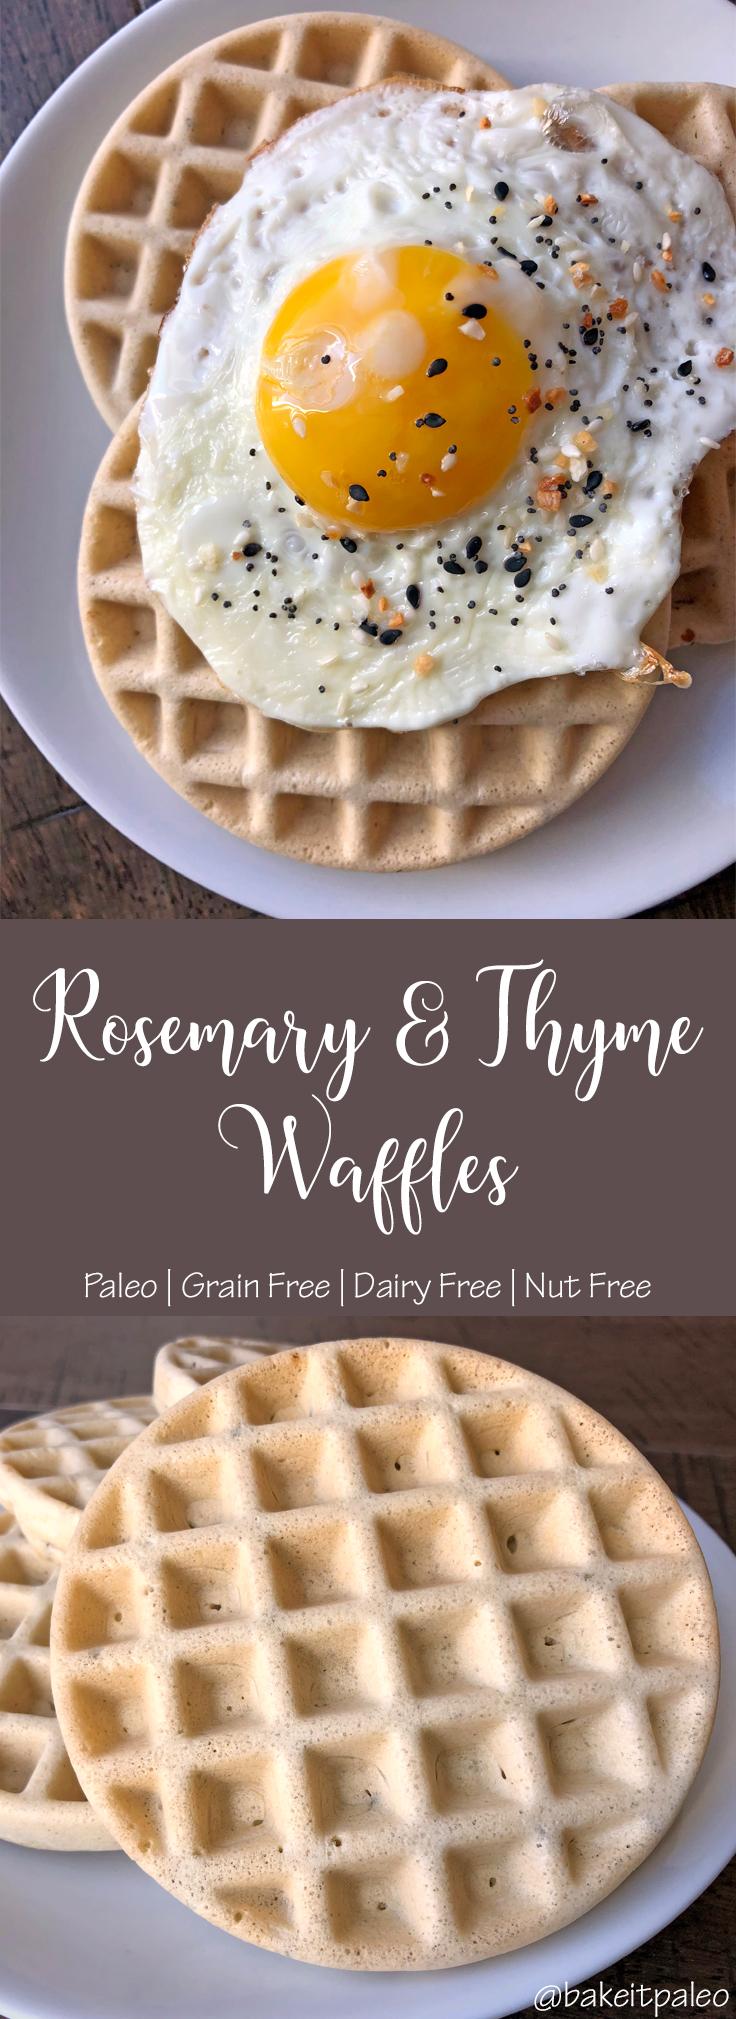 Savory Rosemary & Thyme Paleo Waffles